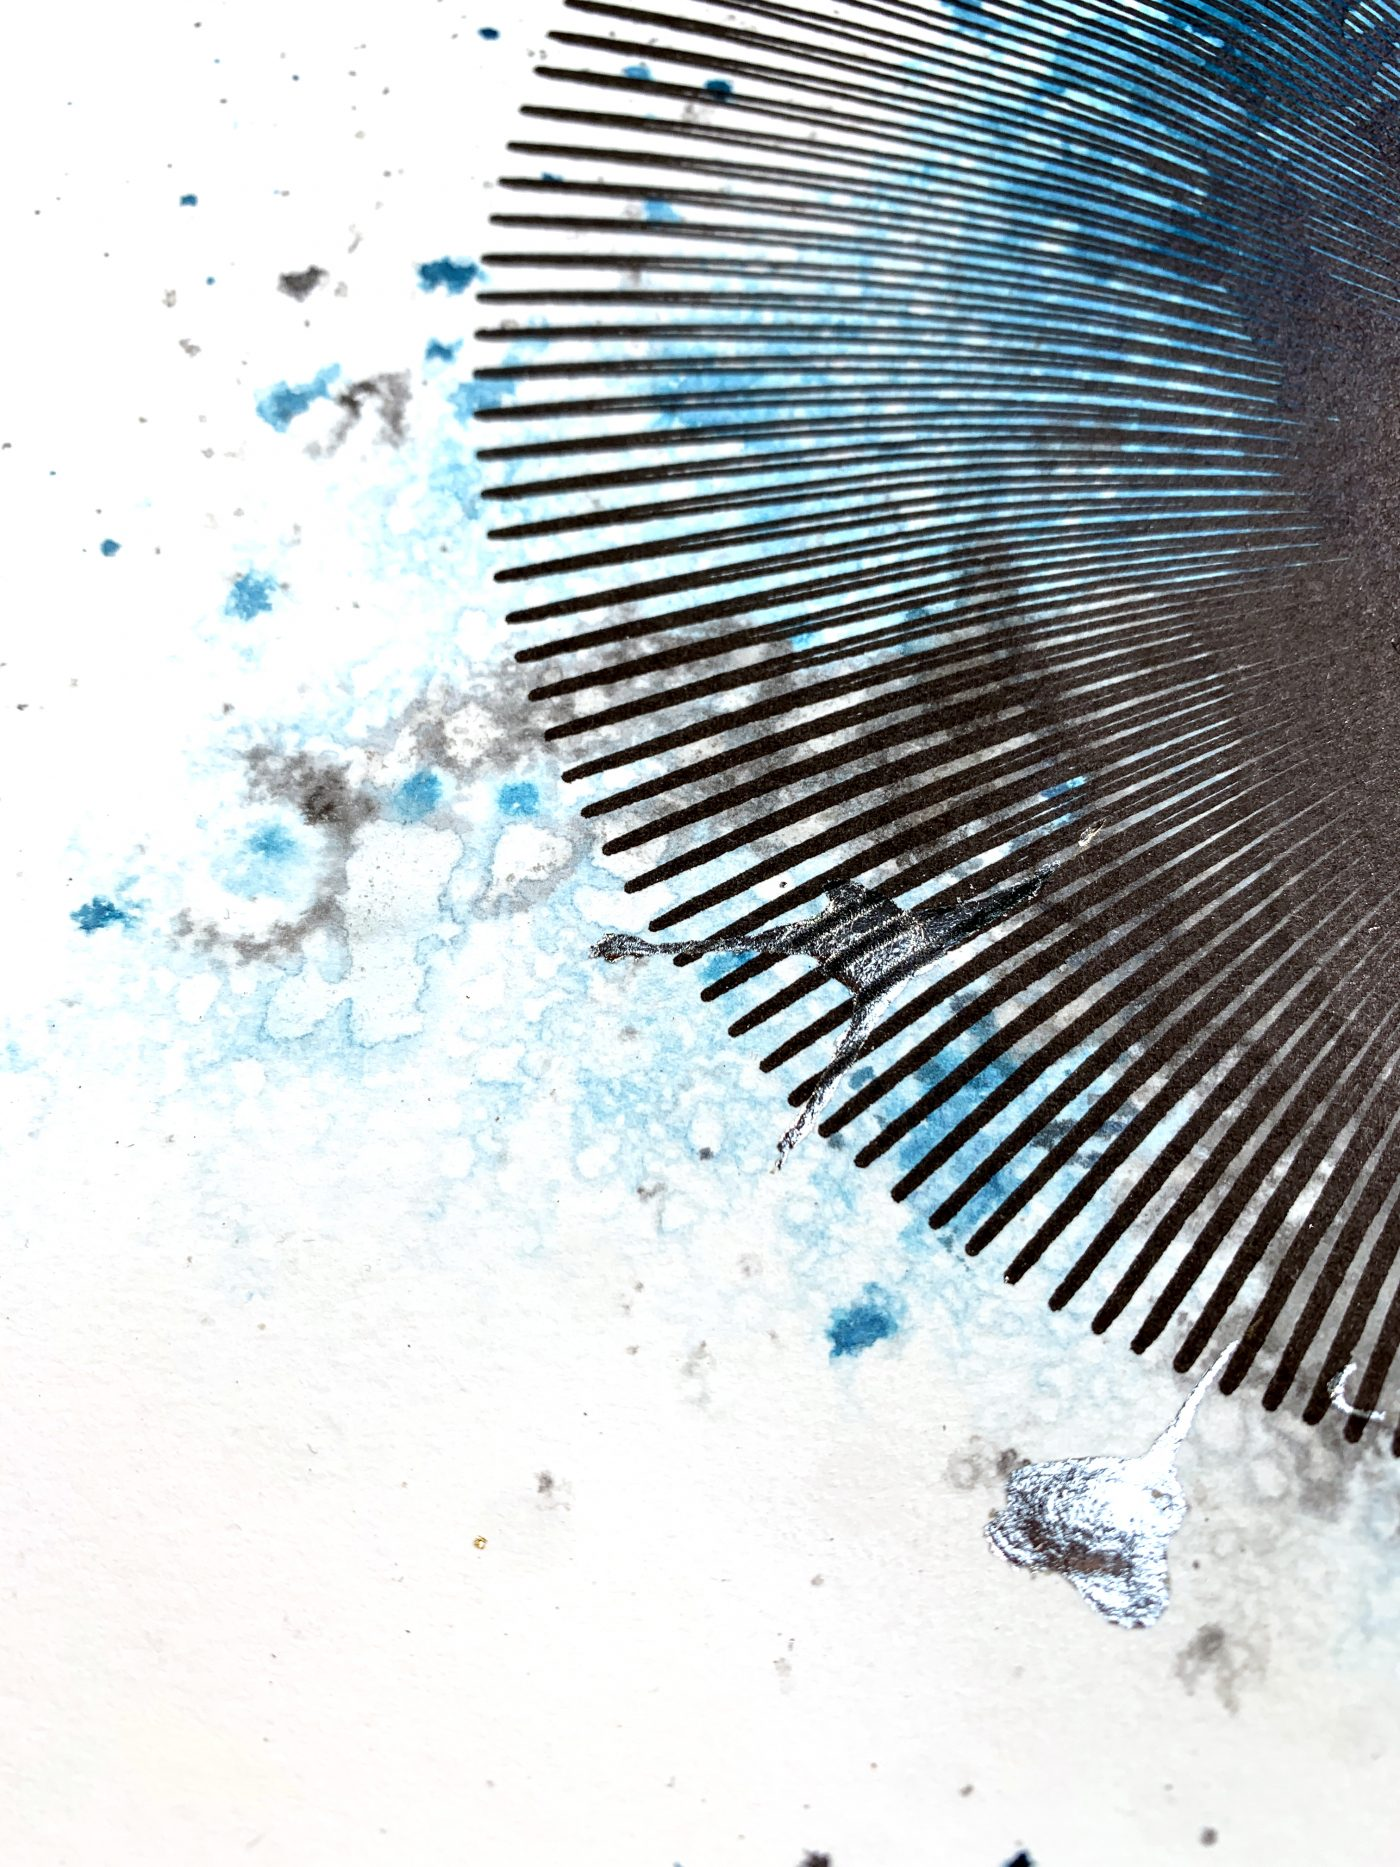 x392 - 26 Jan 2021